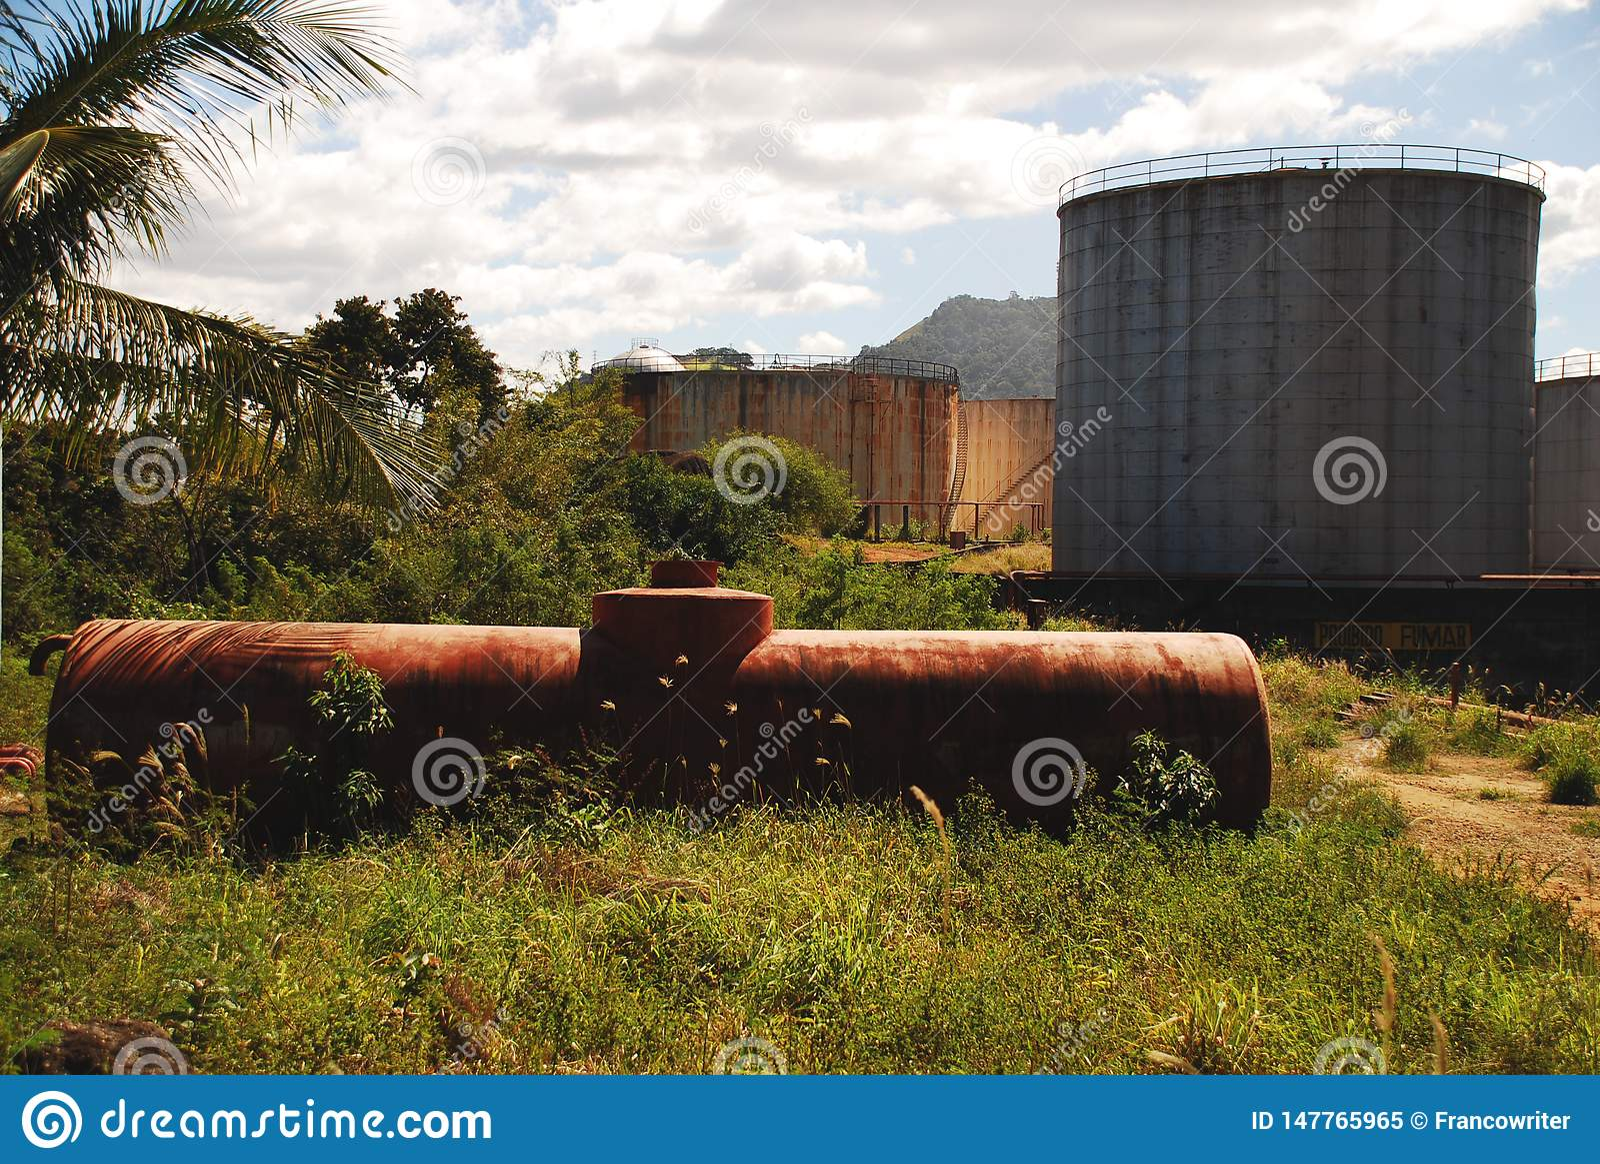 Zaniechani Nafciani zbiorniki w Vitoria, Brazil_03